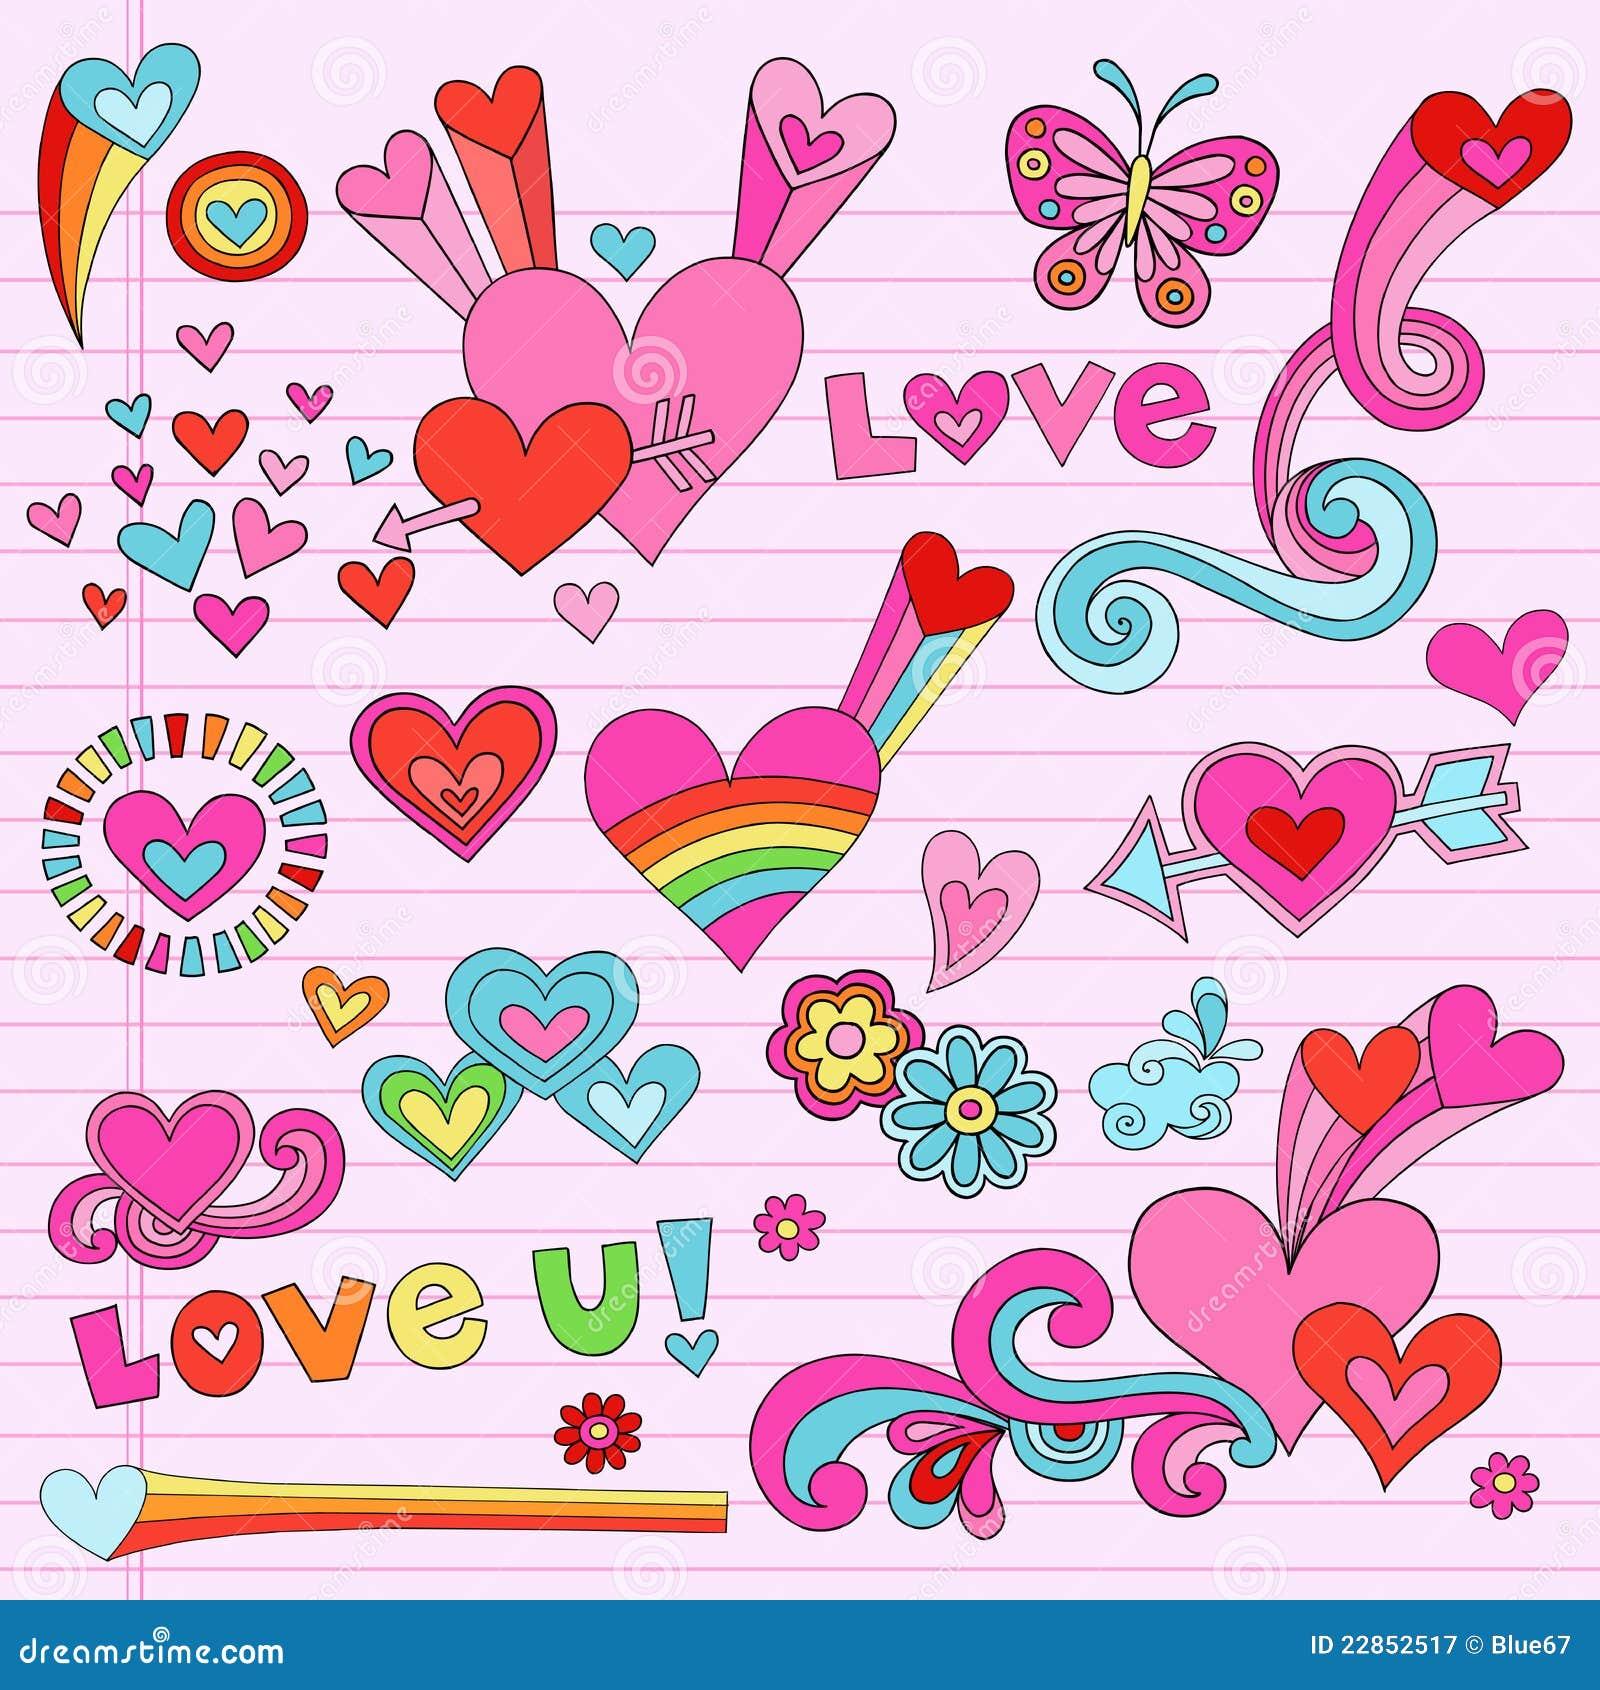 Doodles psychedelic καθορισμένο διάνυσμα αγάπης καρδιών